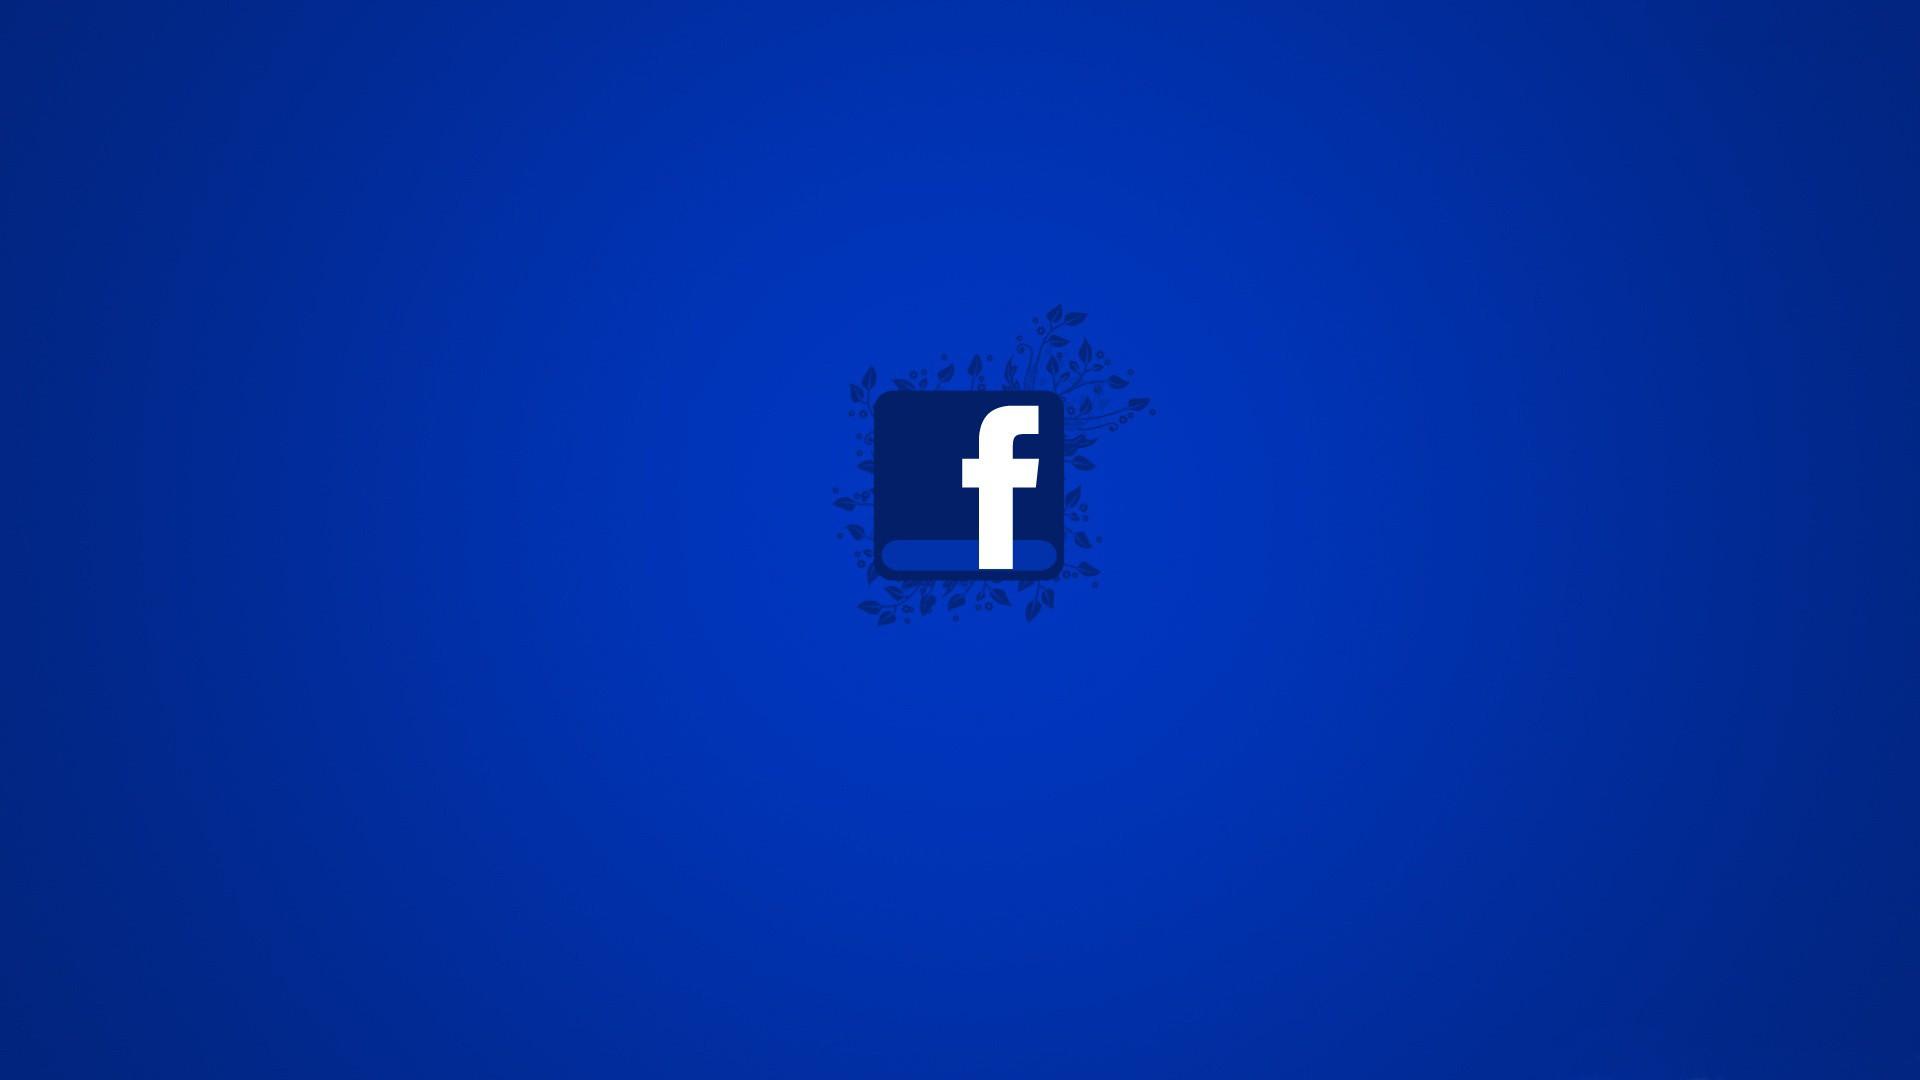 Next Facebook Townhall QA Summit Will Be At IIT Delhi On 28 October